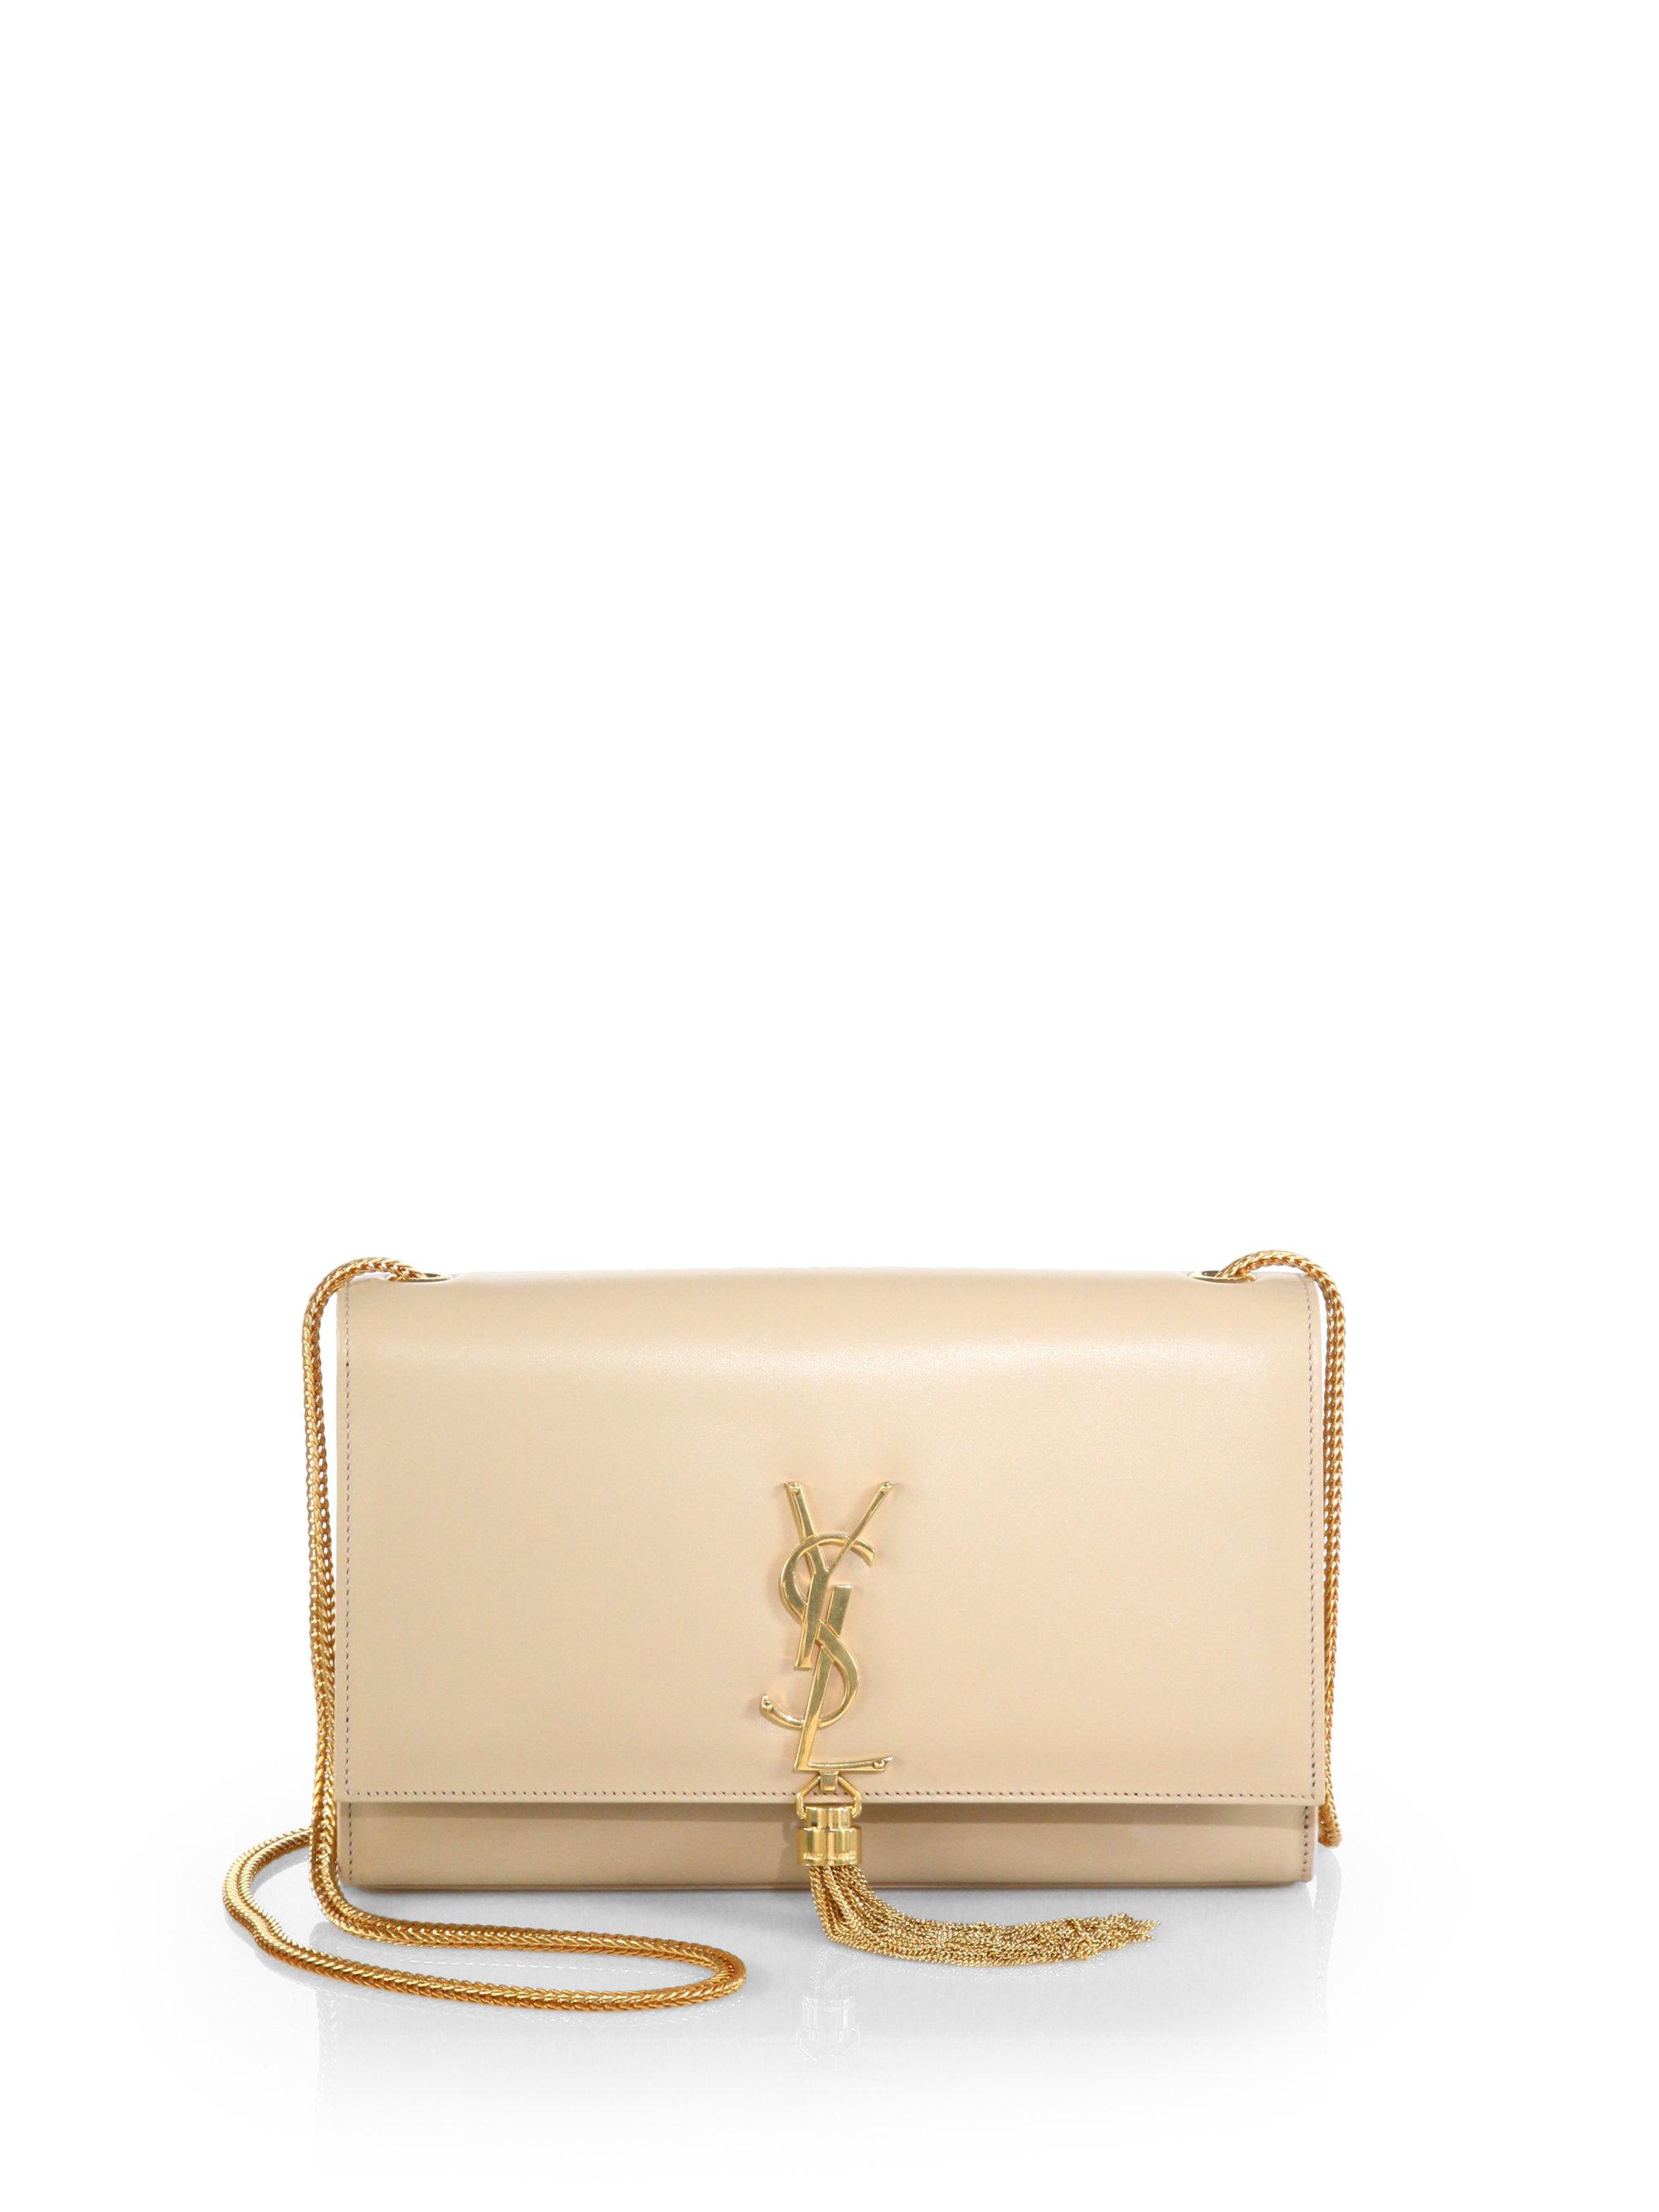 YSL Patent Leather Tassel Chain Bag White